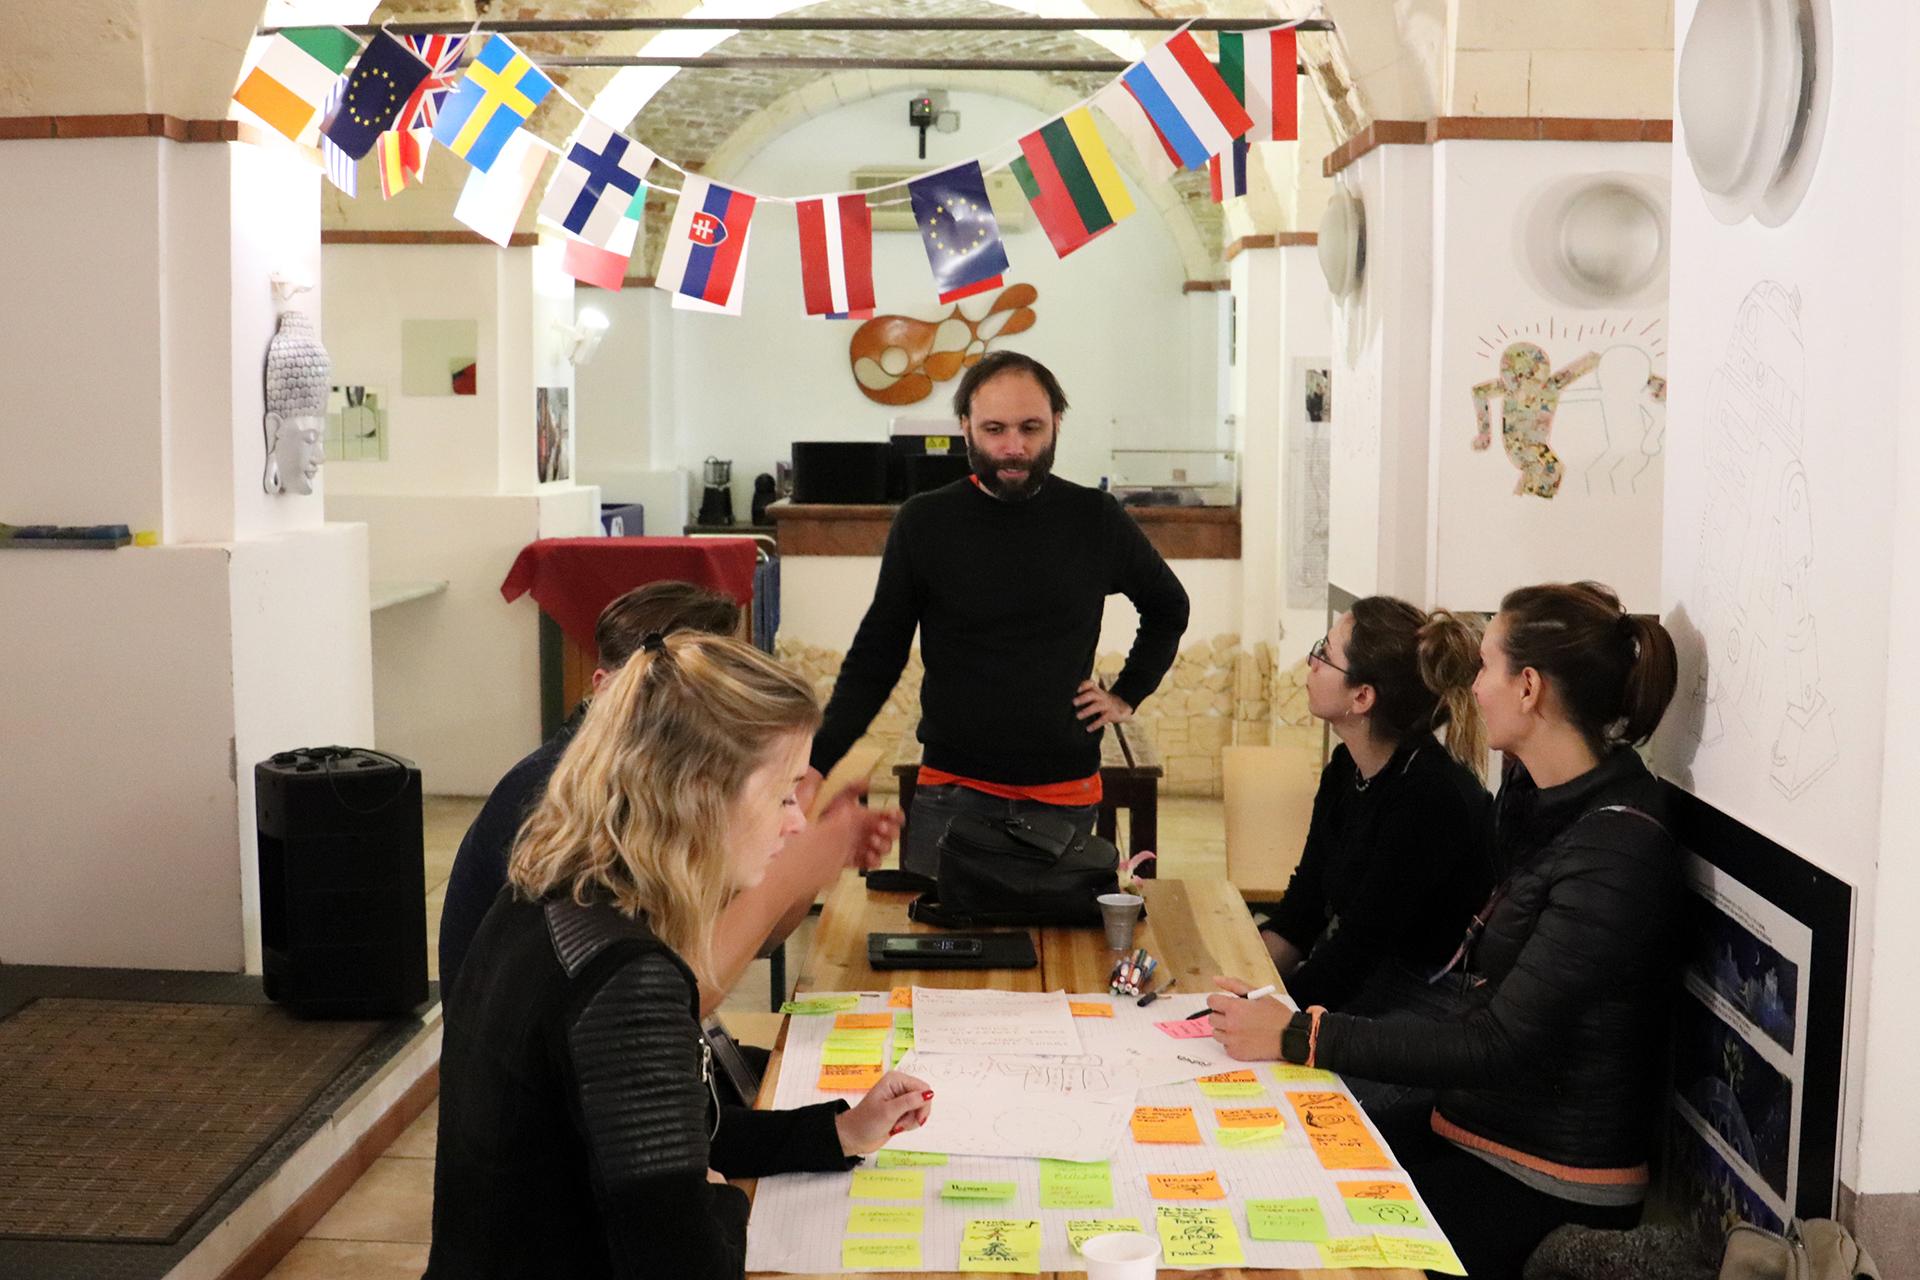 Inclusive Learning Strategies - Brainstorming